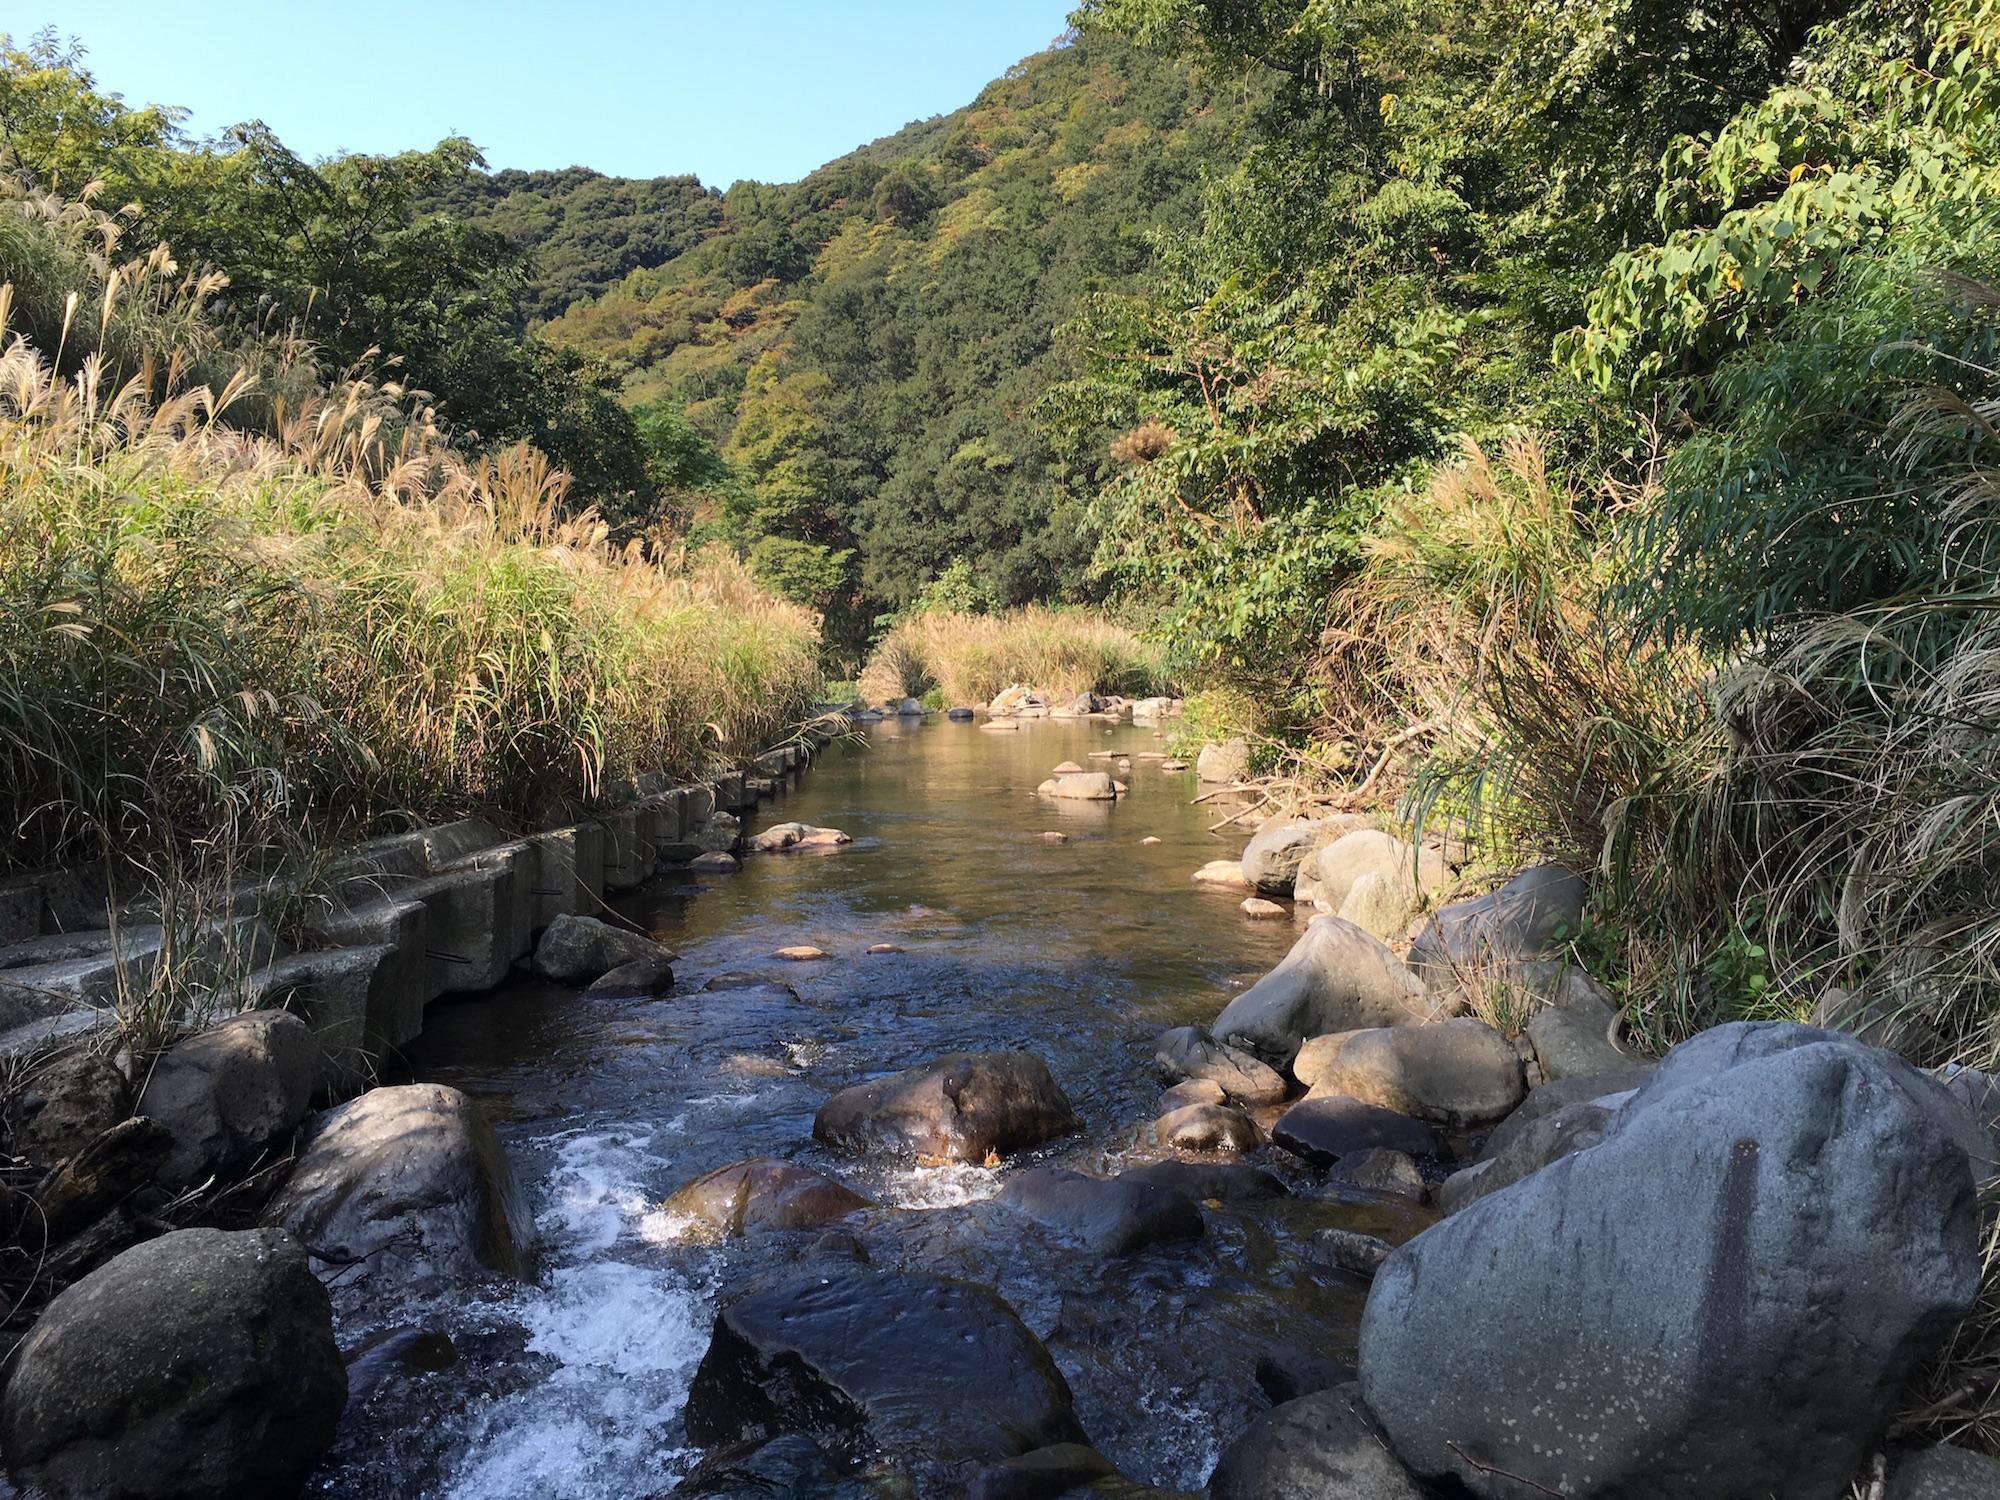 A lovely stream